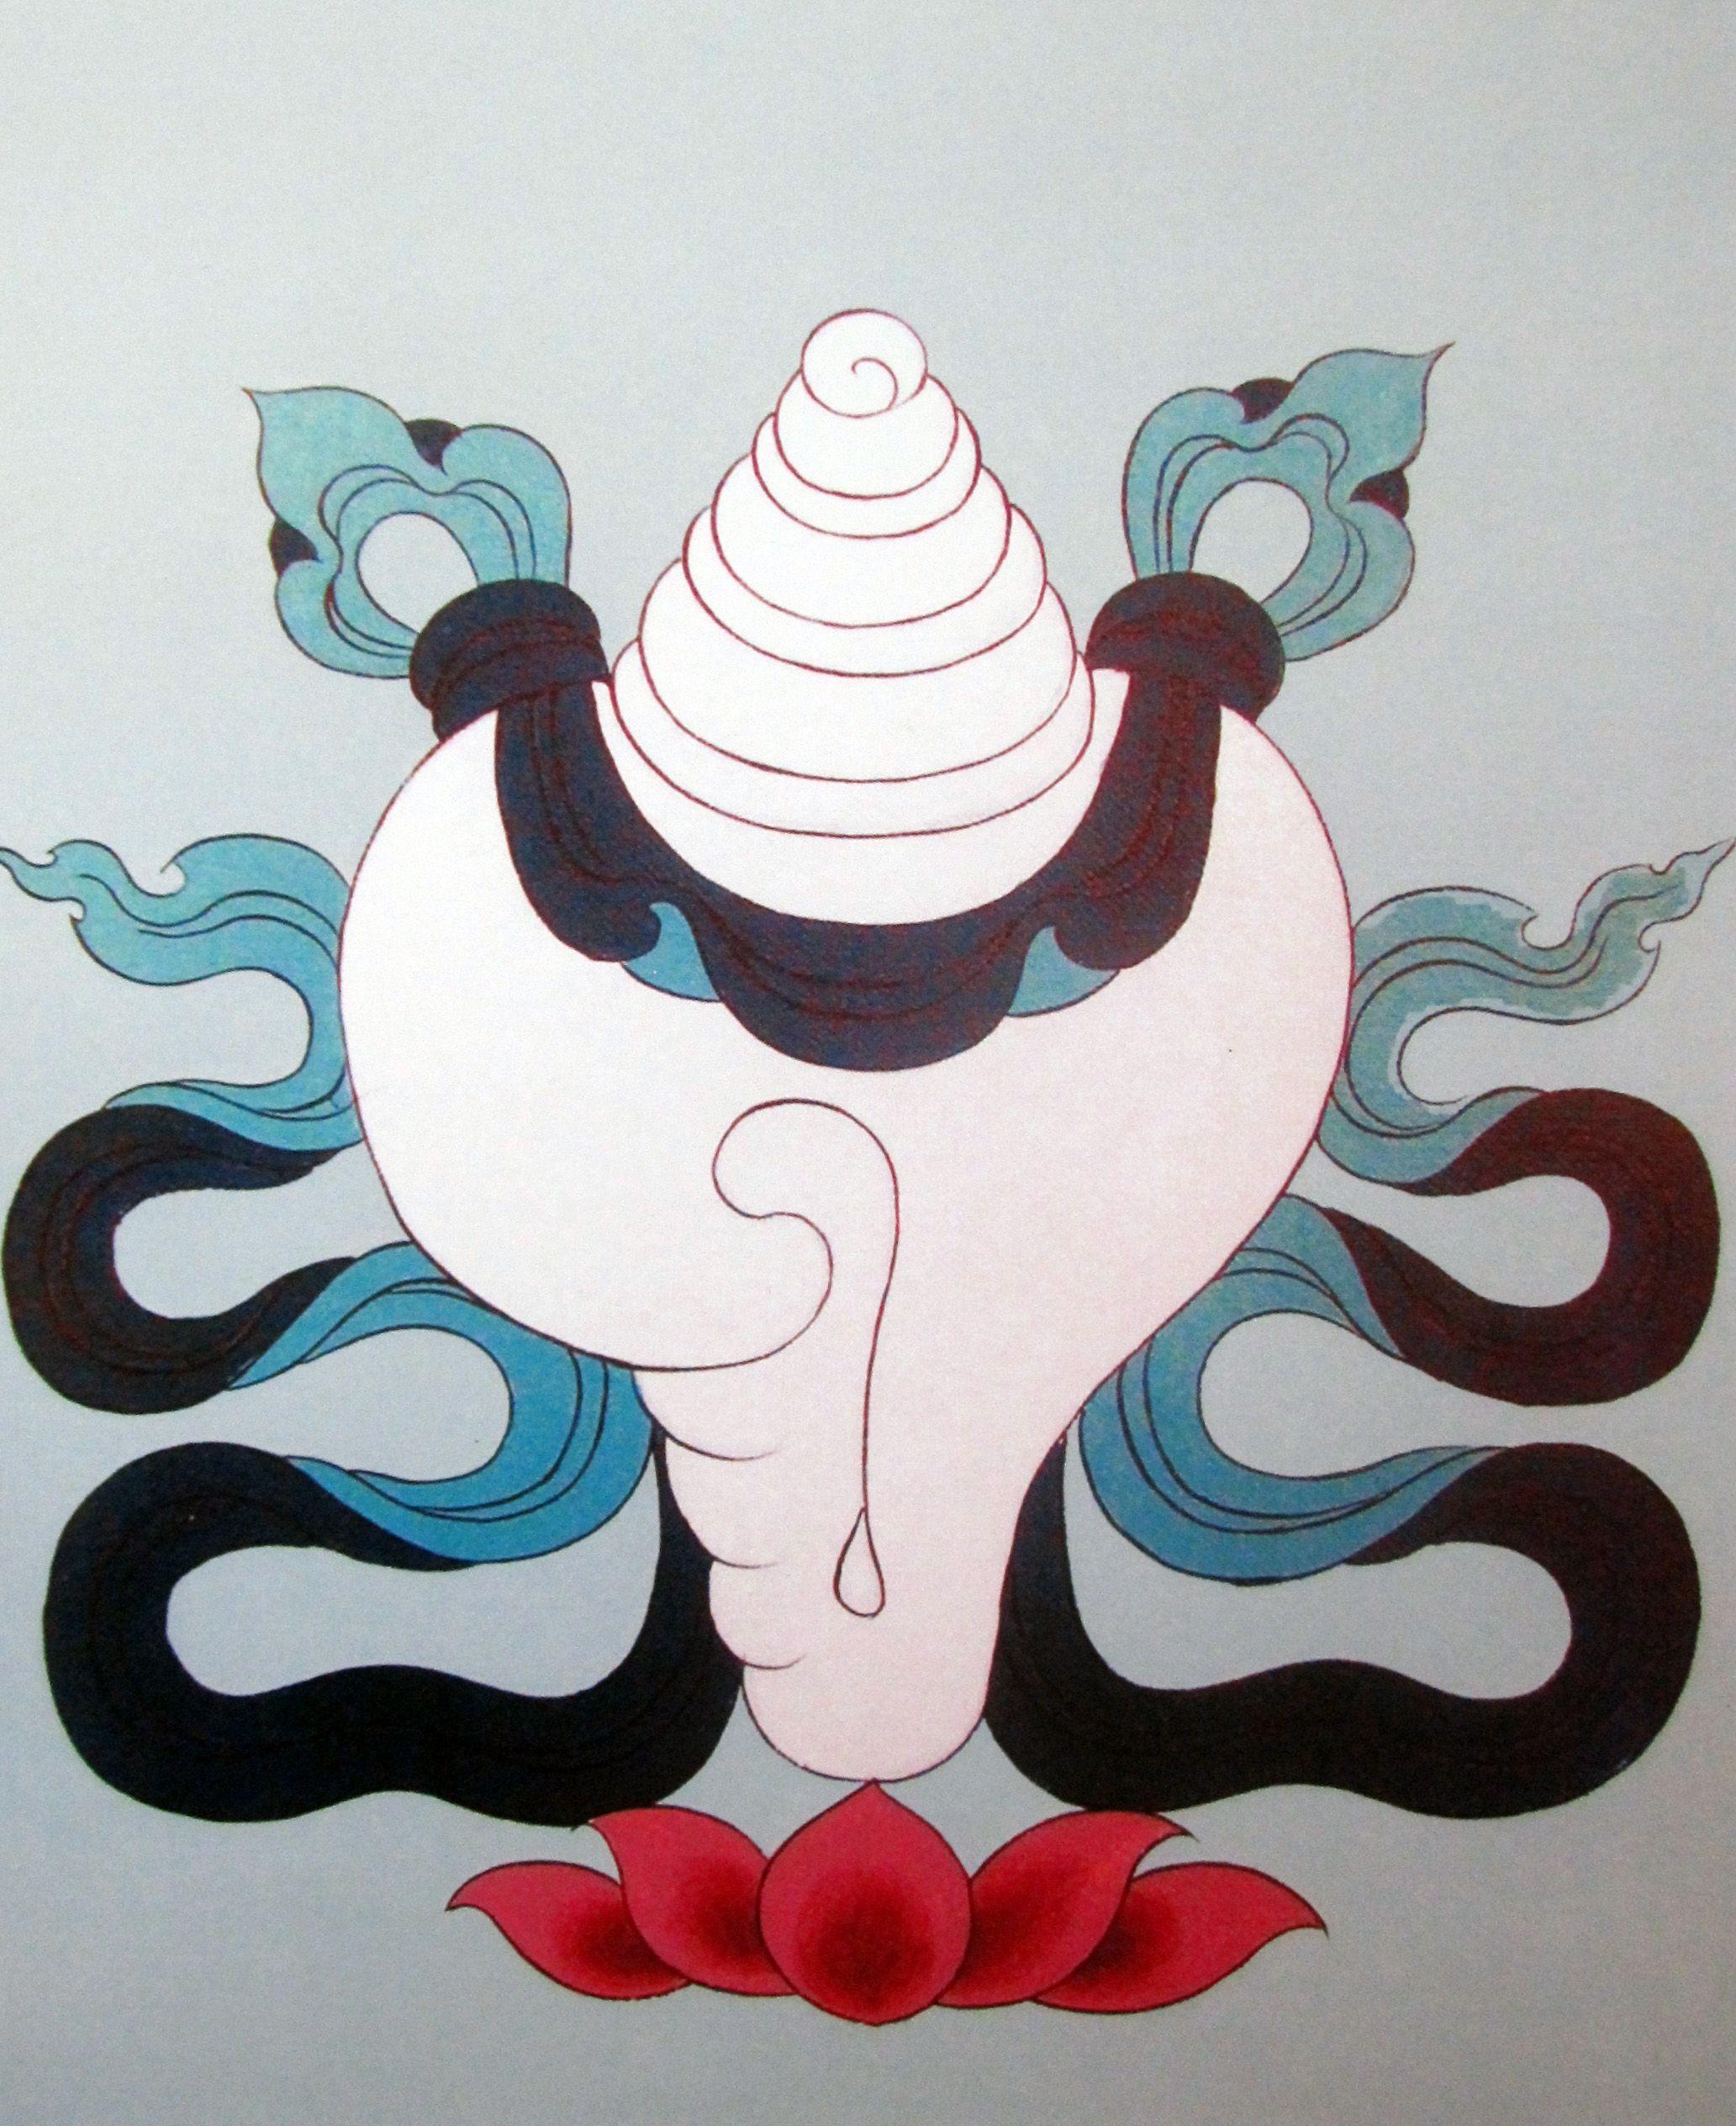 Yungdrung bon sacred symbols nine ways feng shui home buddhist art biocorpaavc Gallery